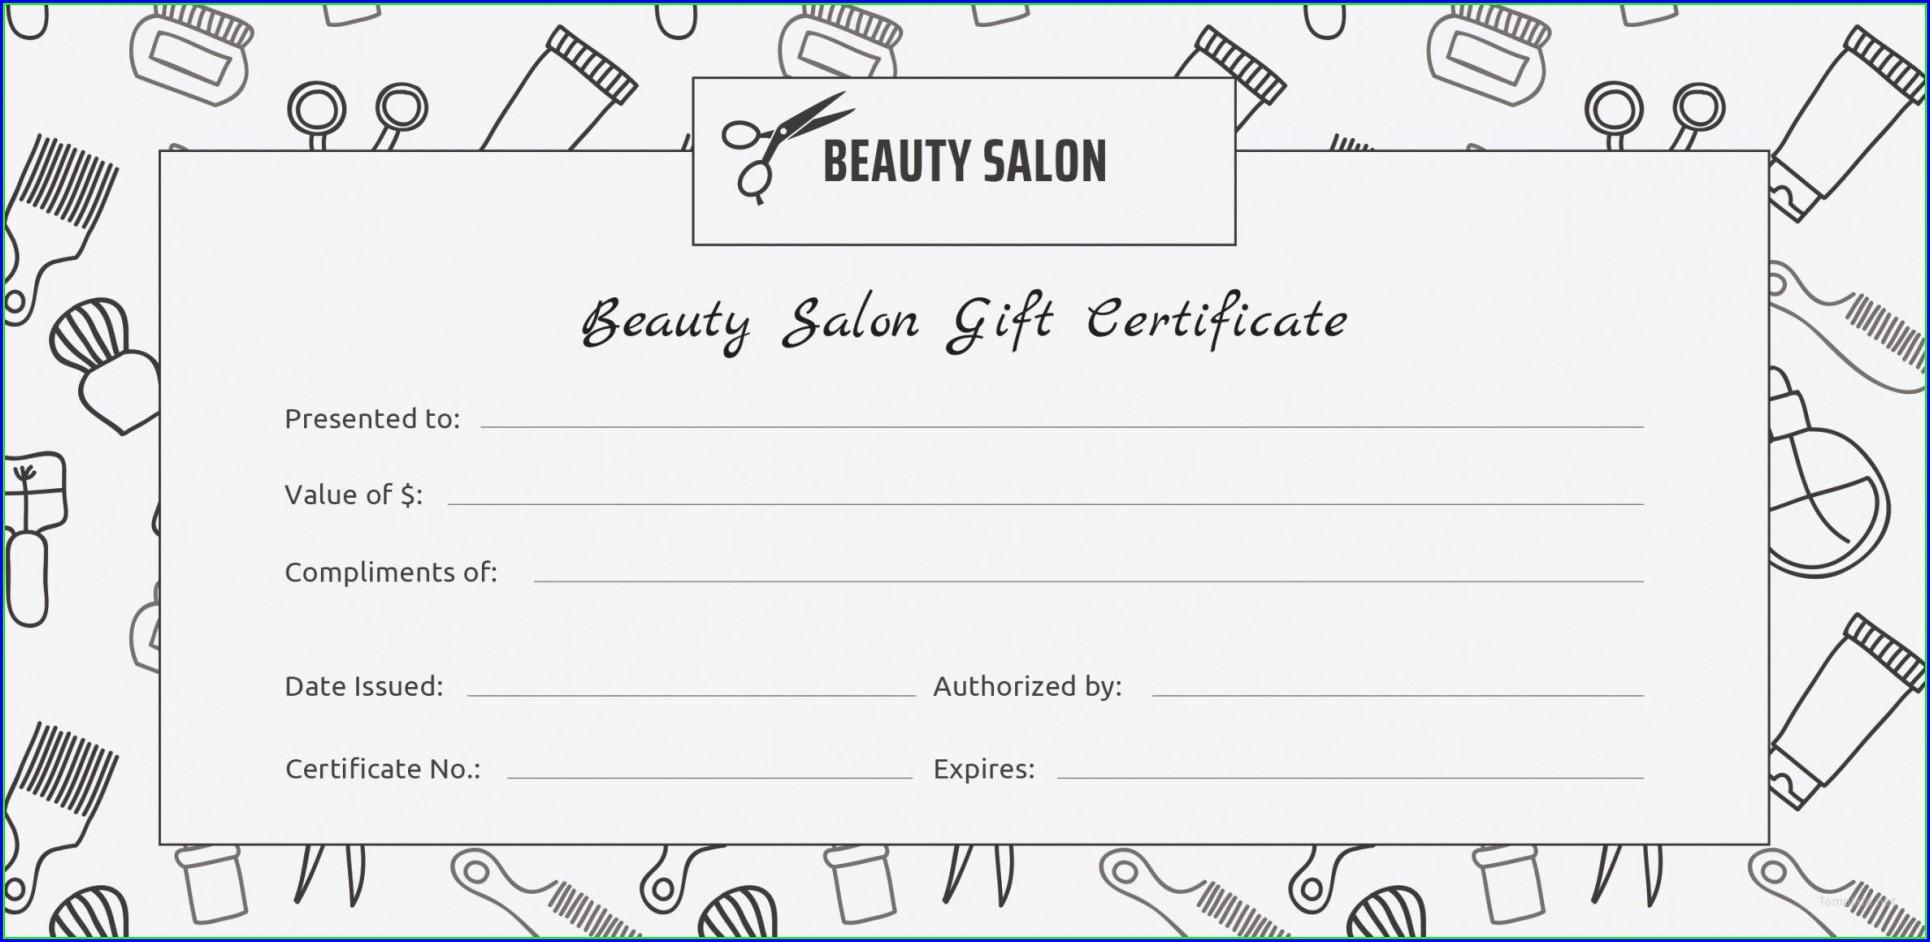 Printable Gift Certificate Template Hair Salon